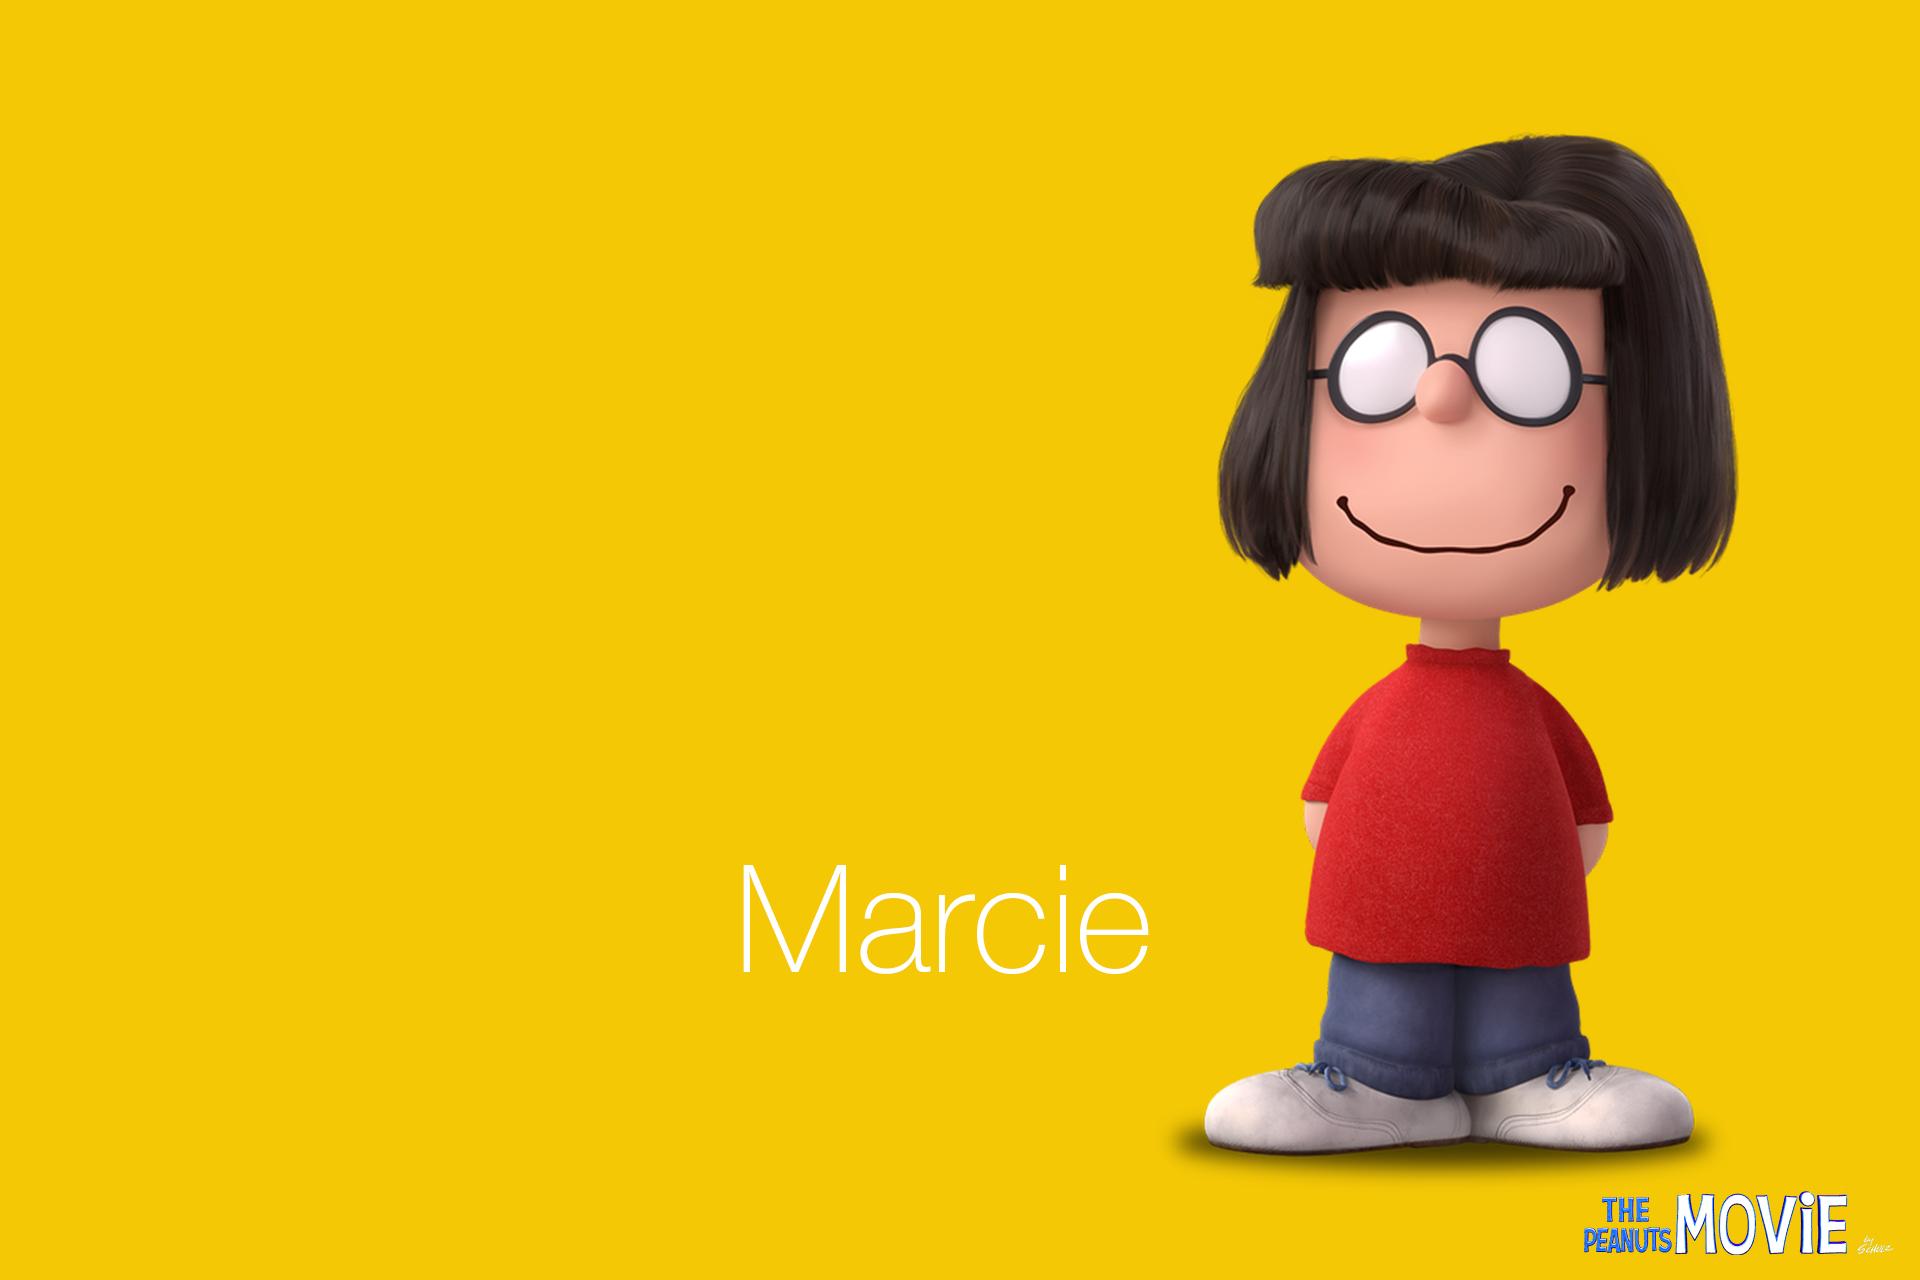 The Peanuts Movie: Marcie photo | VolGanga